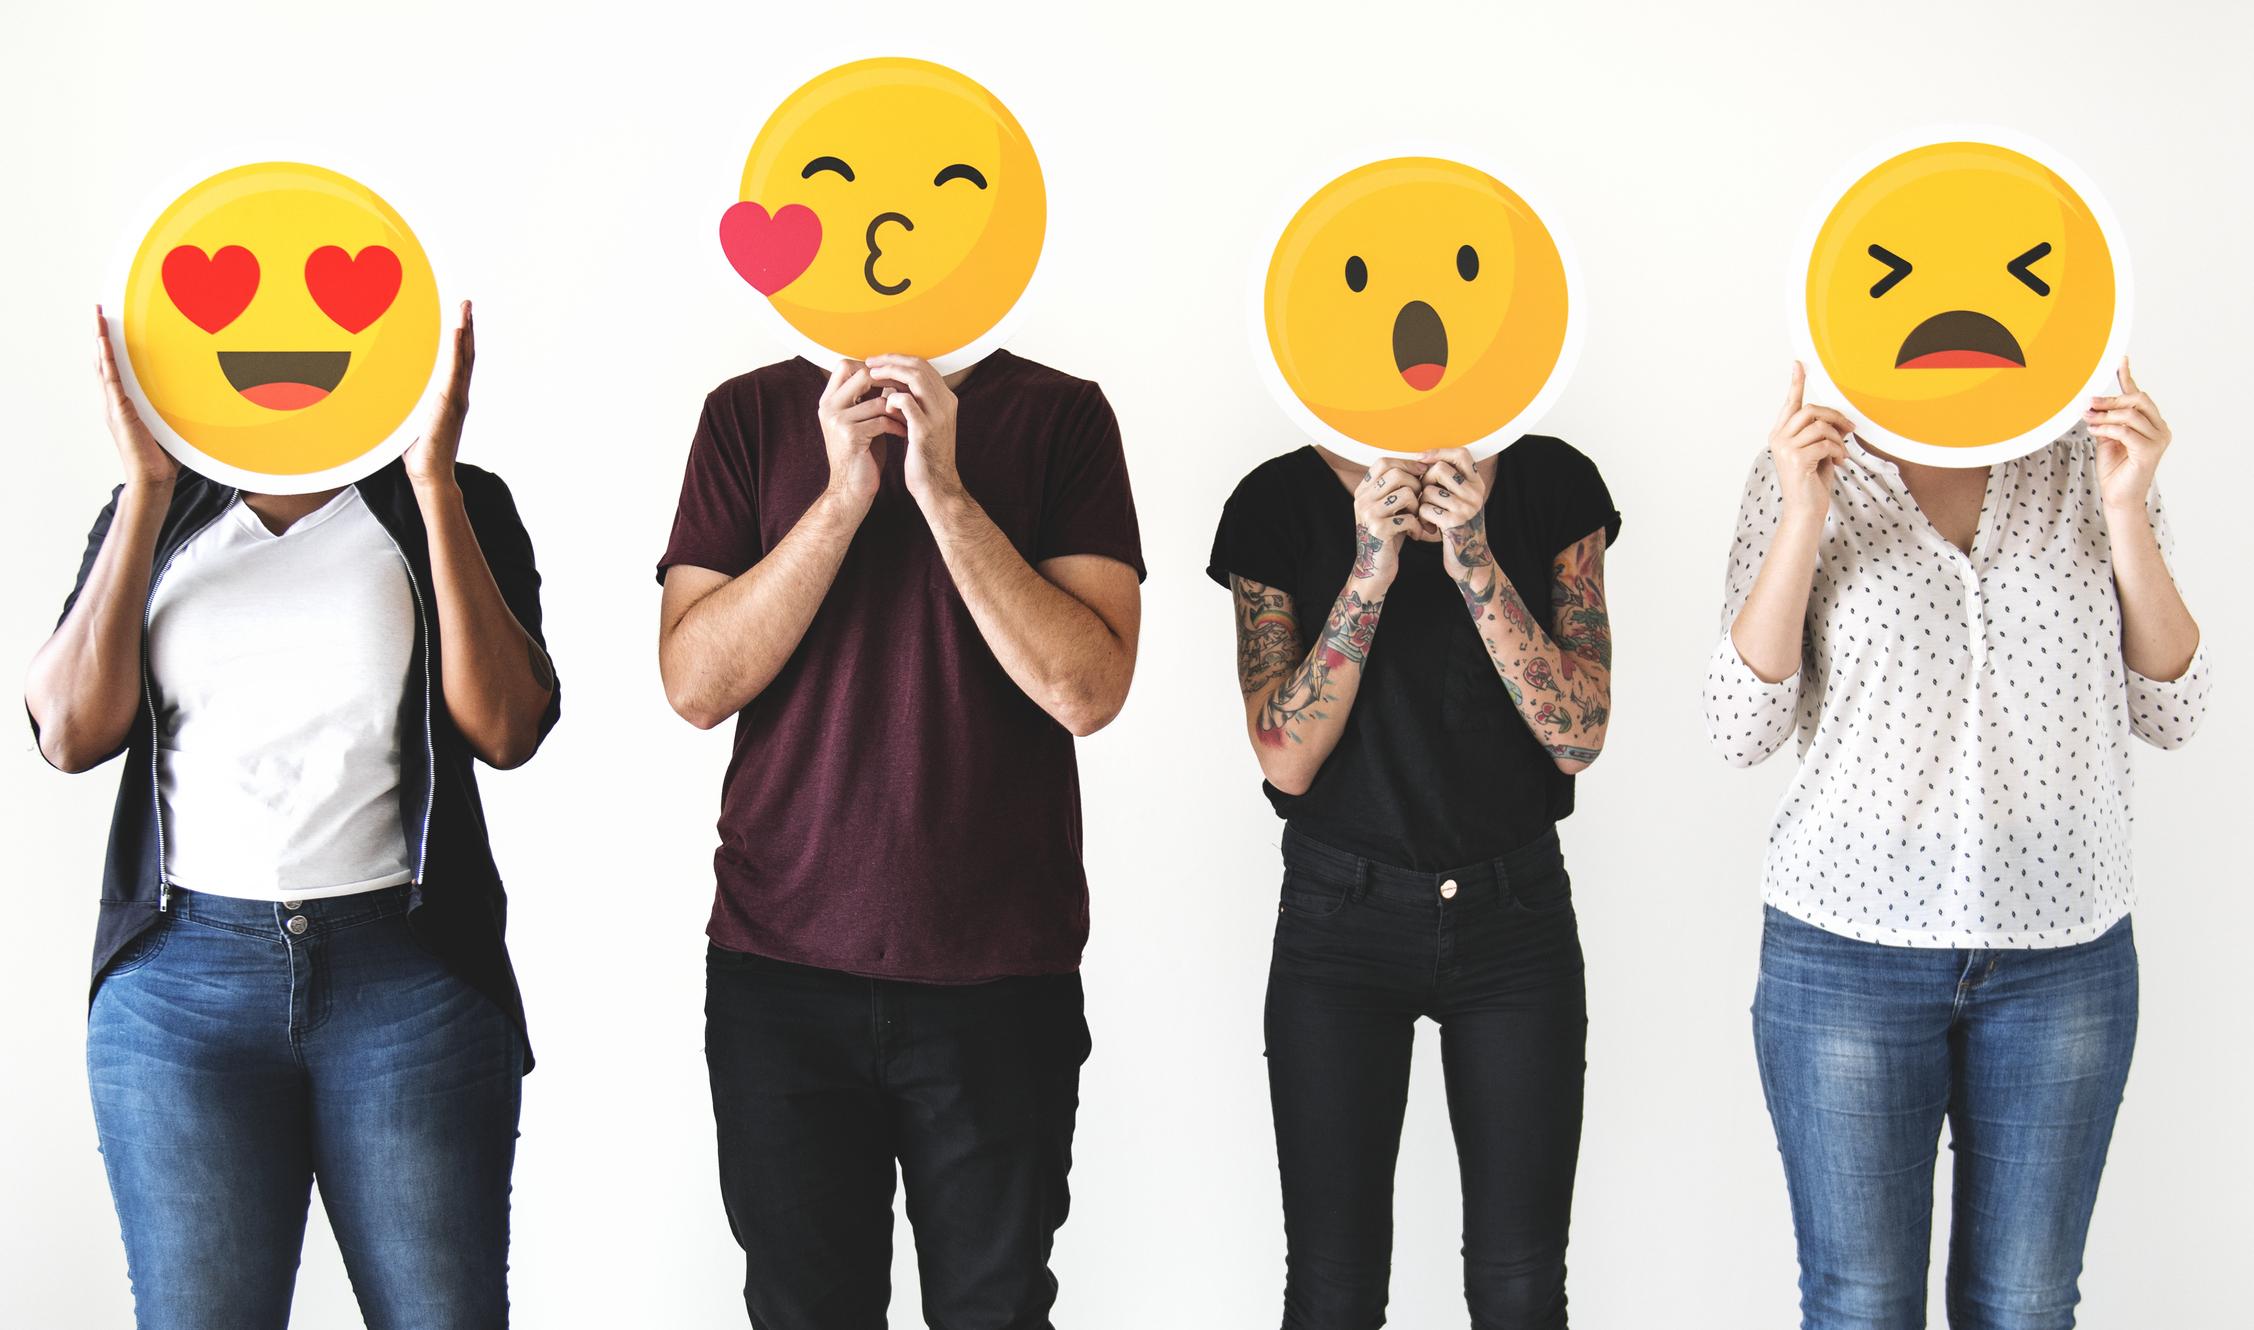 stock graphic of audience members as emojis